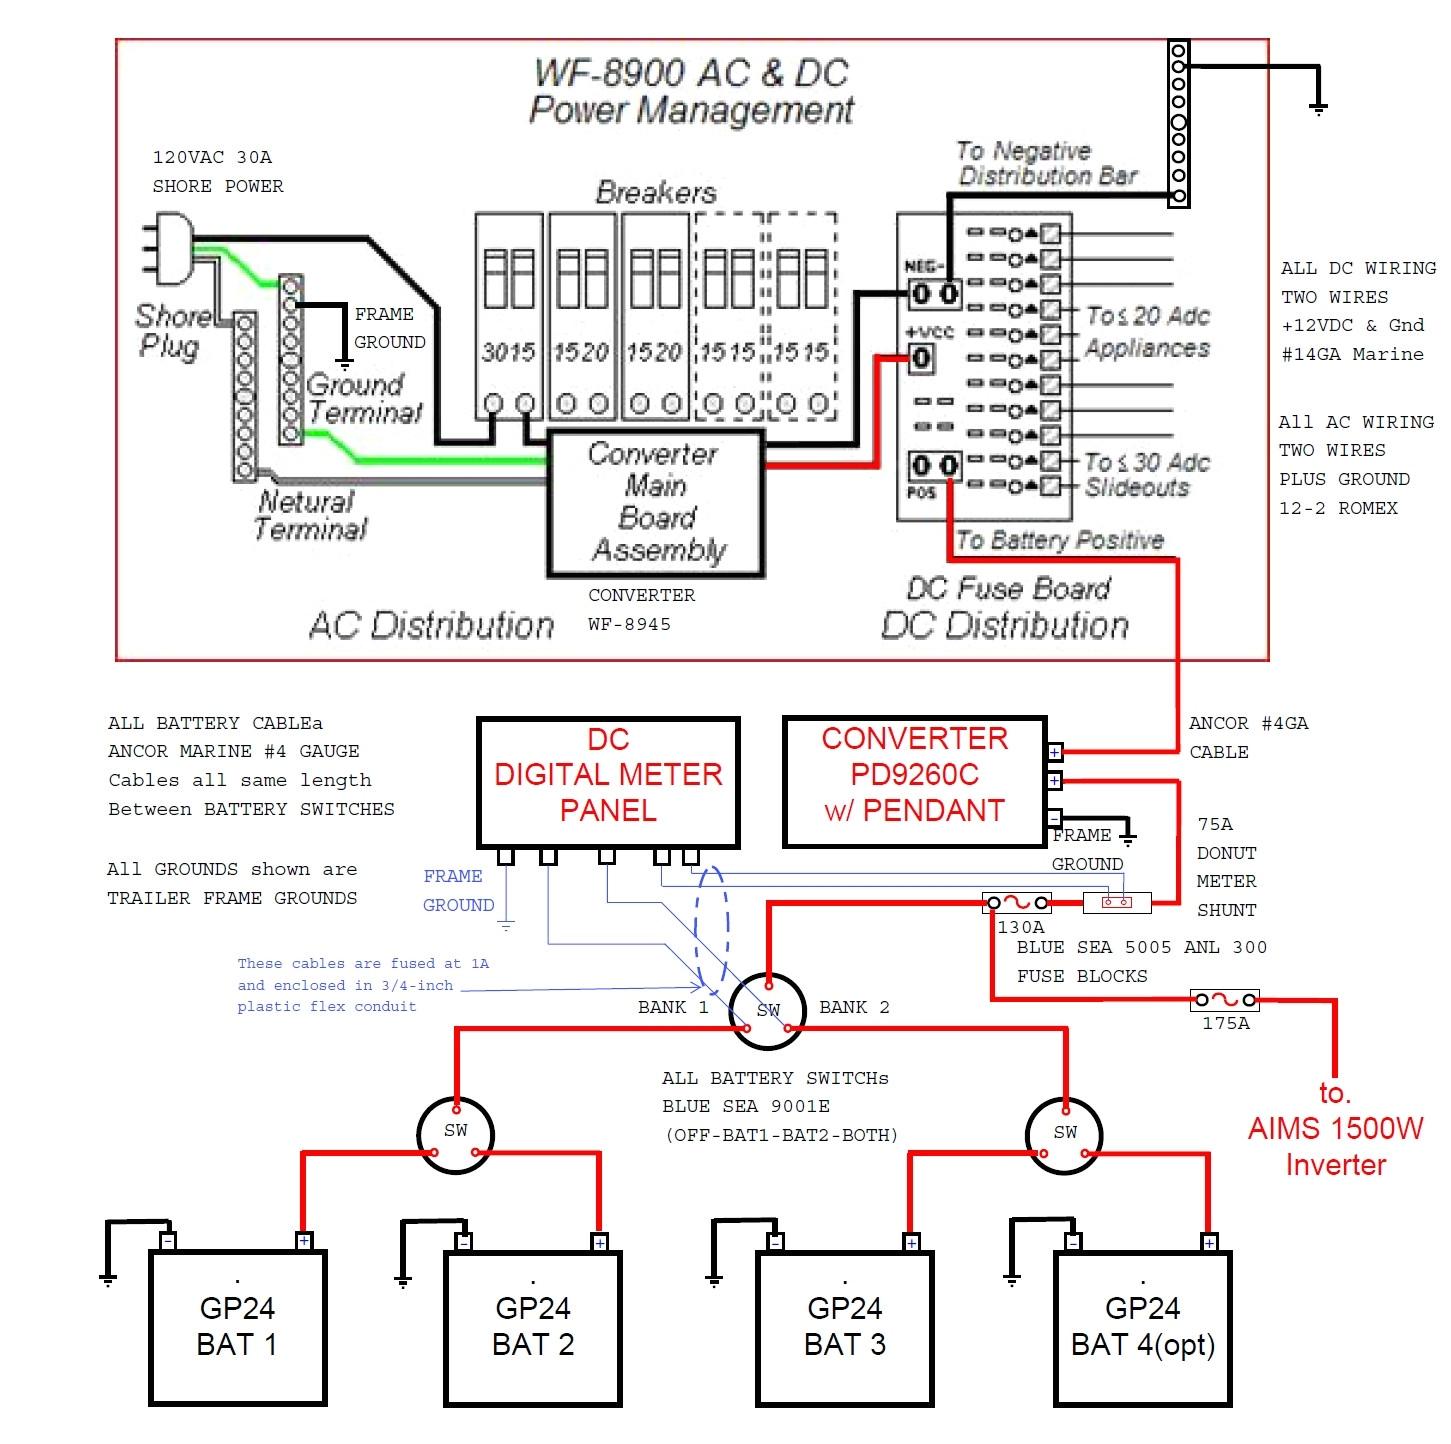 wiring diagram further wiring 50 rv service on 50 amp rv power cord 30 amp rv